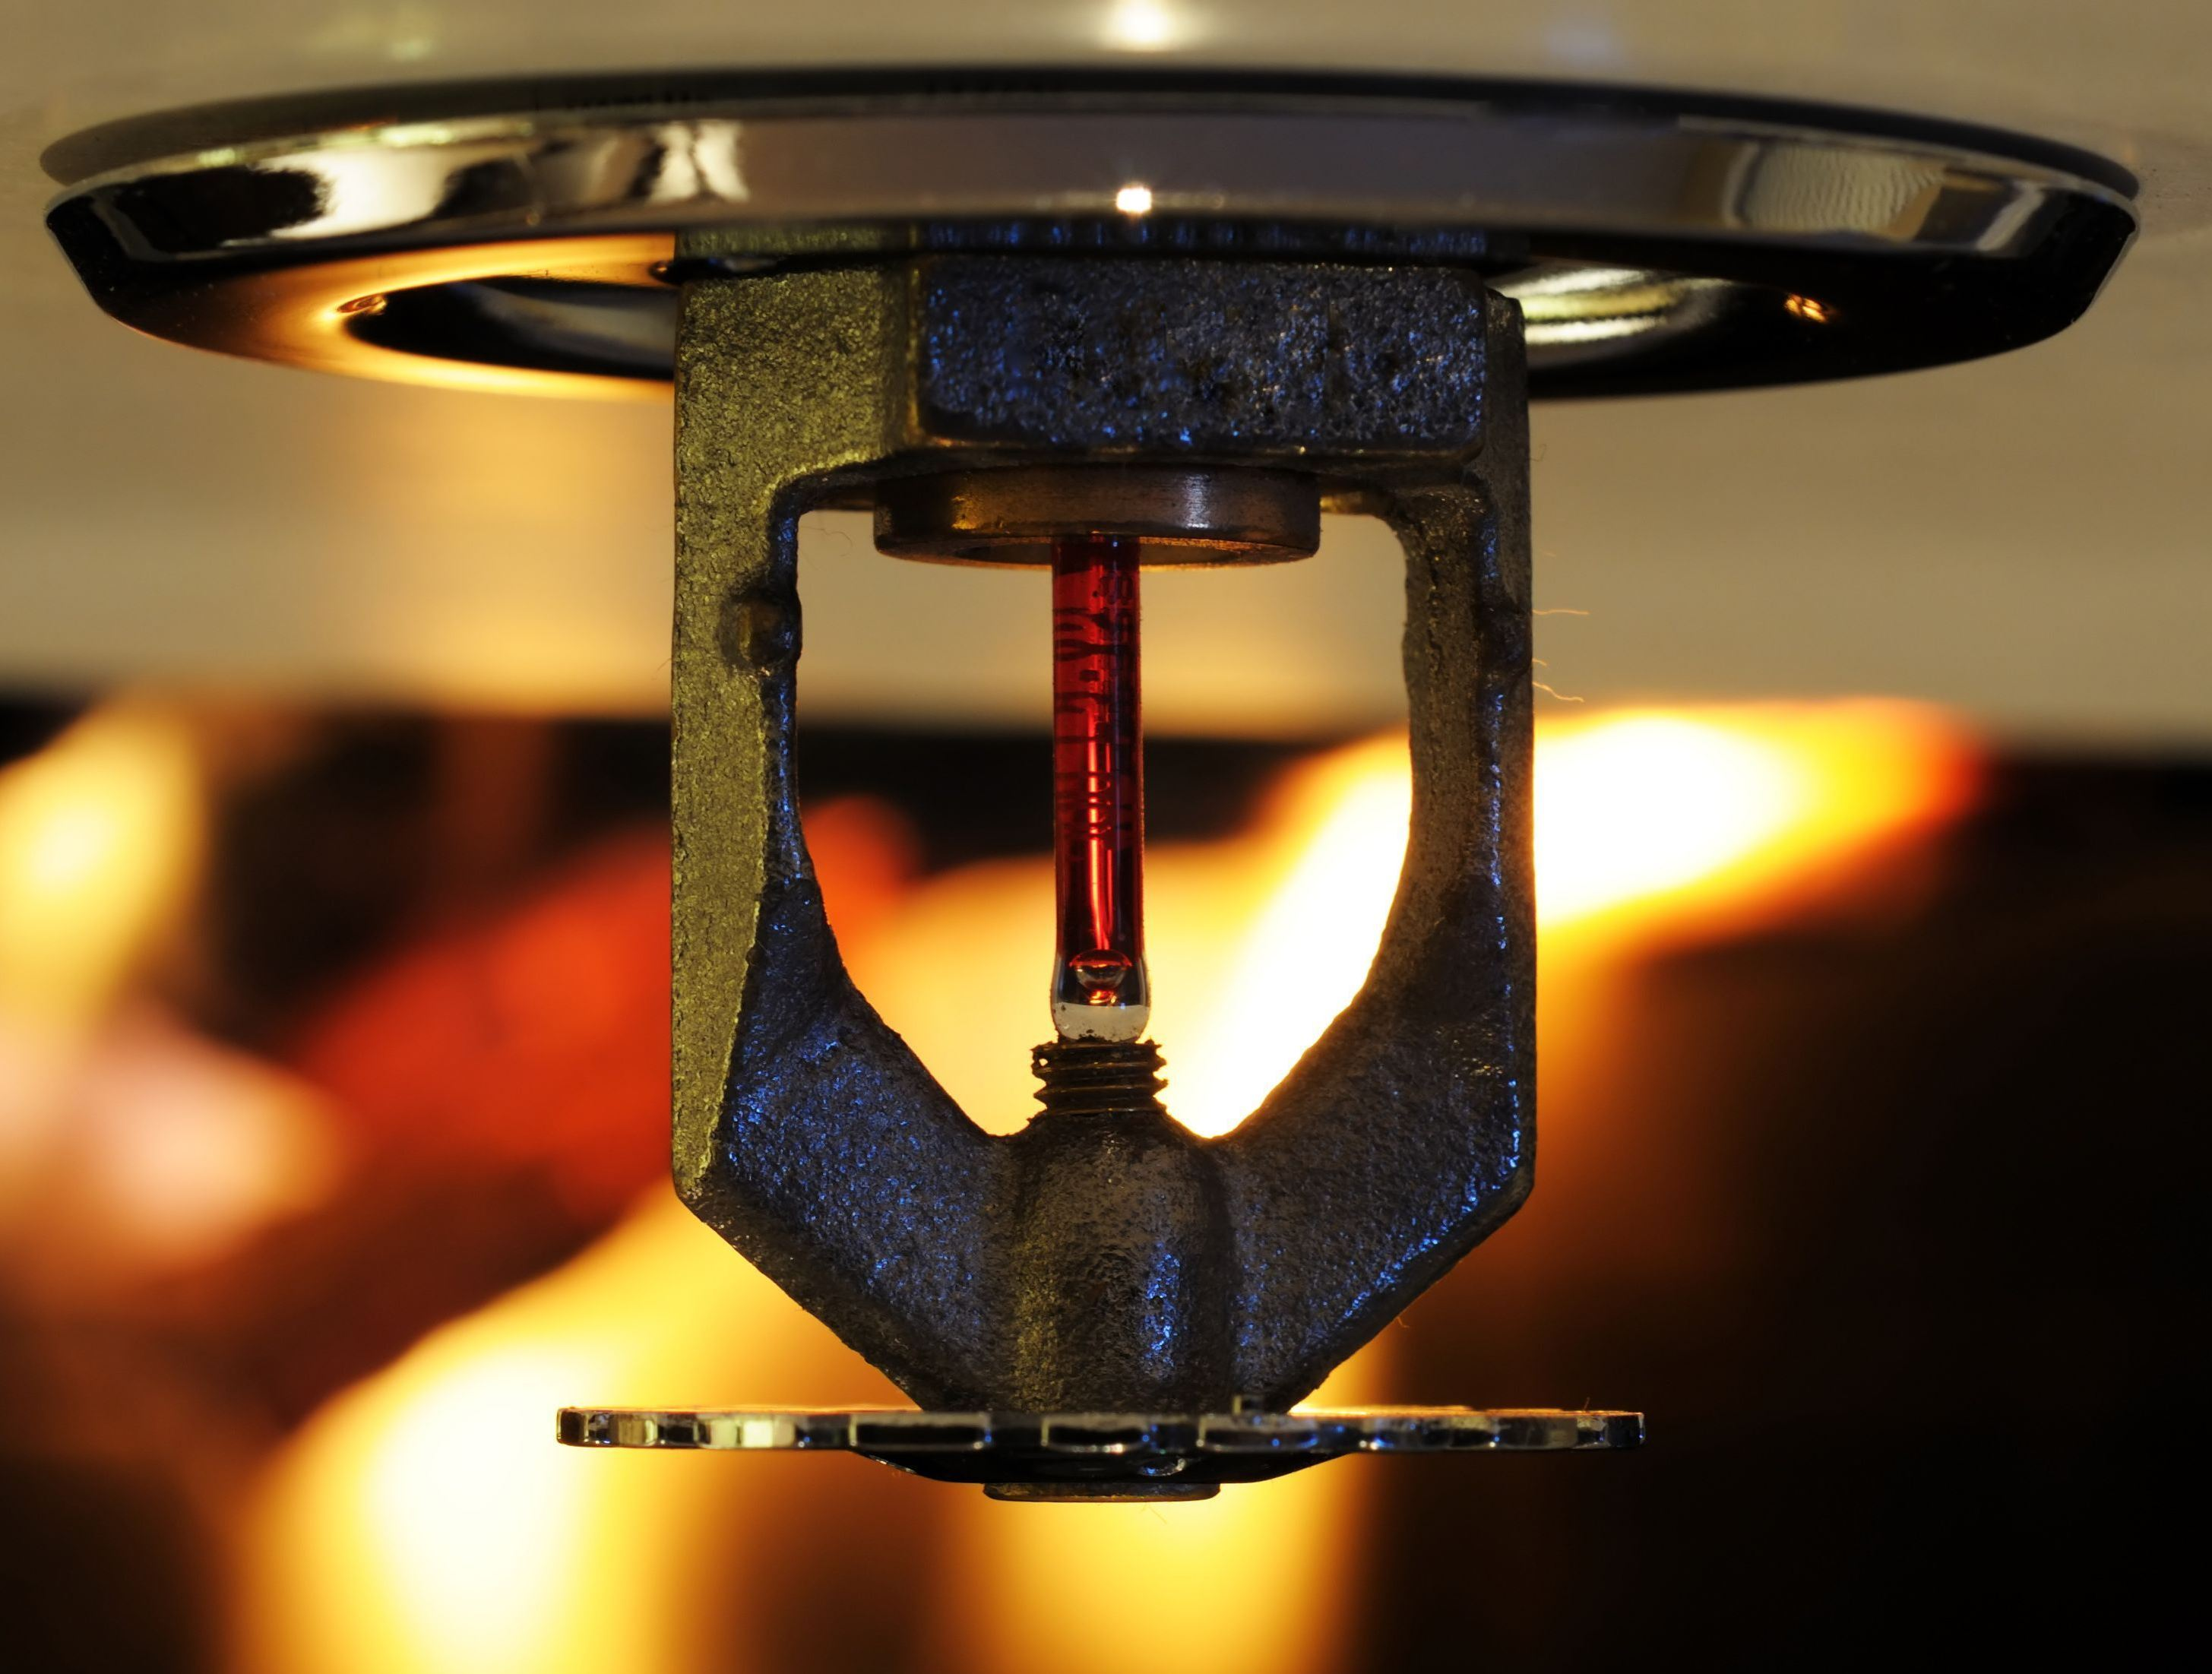 Fire Sprinkler Safety Services Toronto